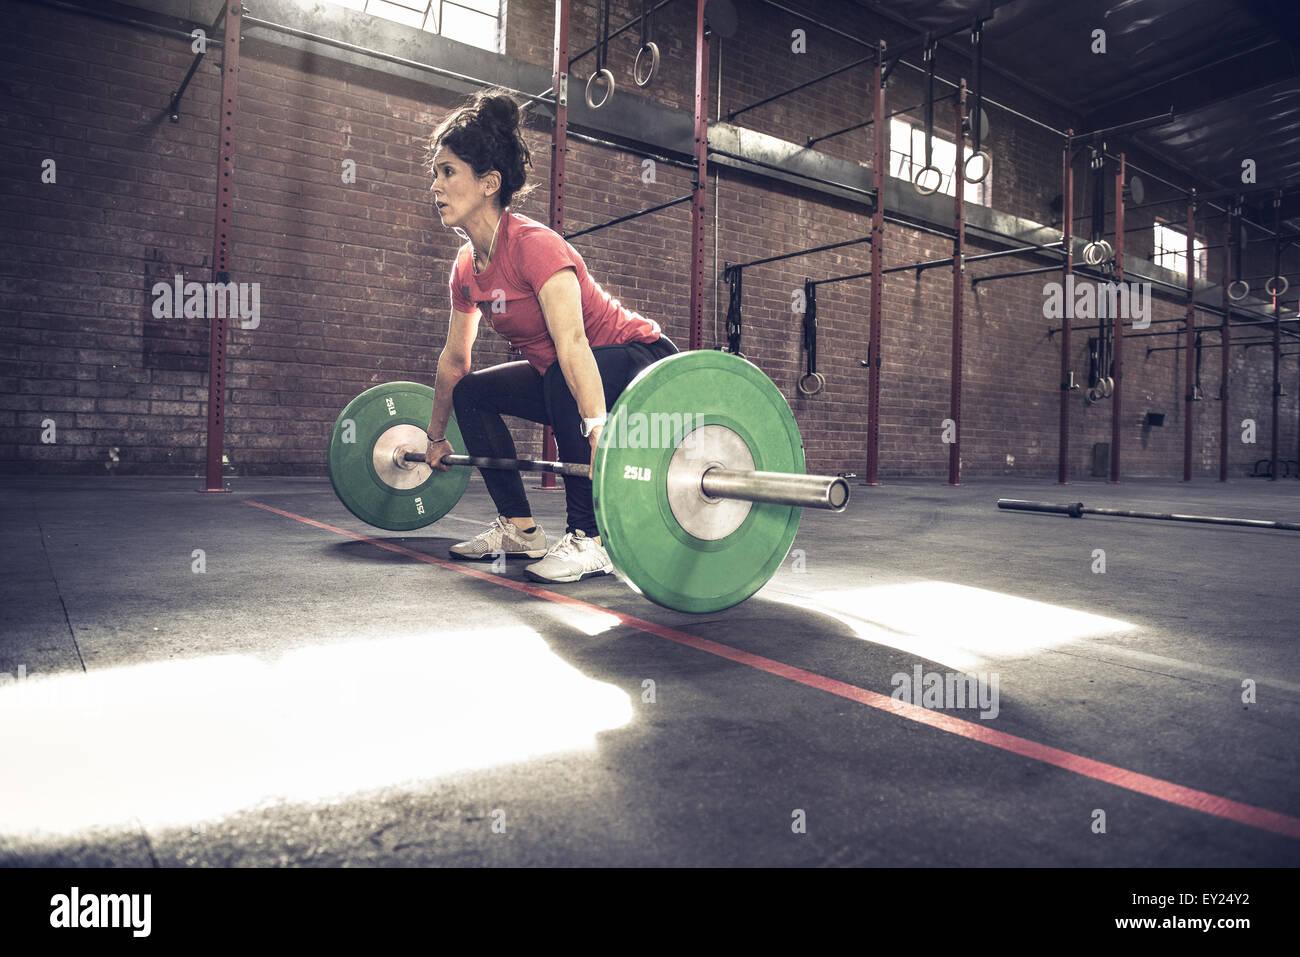 Mujer joven agacharse para levantar barbell en gimnasio Imagen De Stock